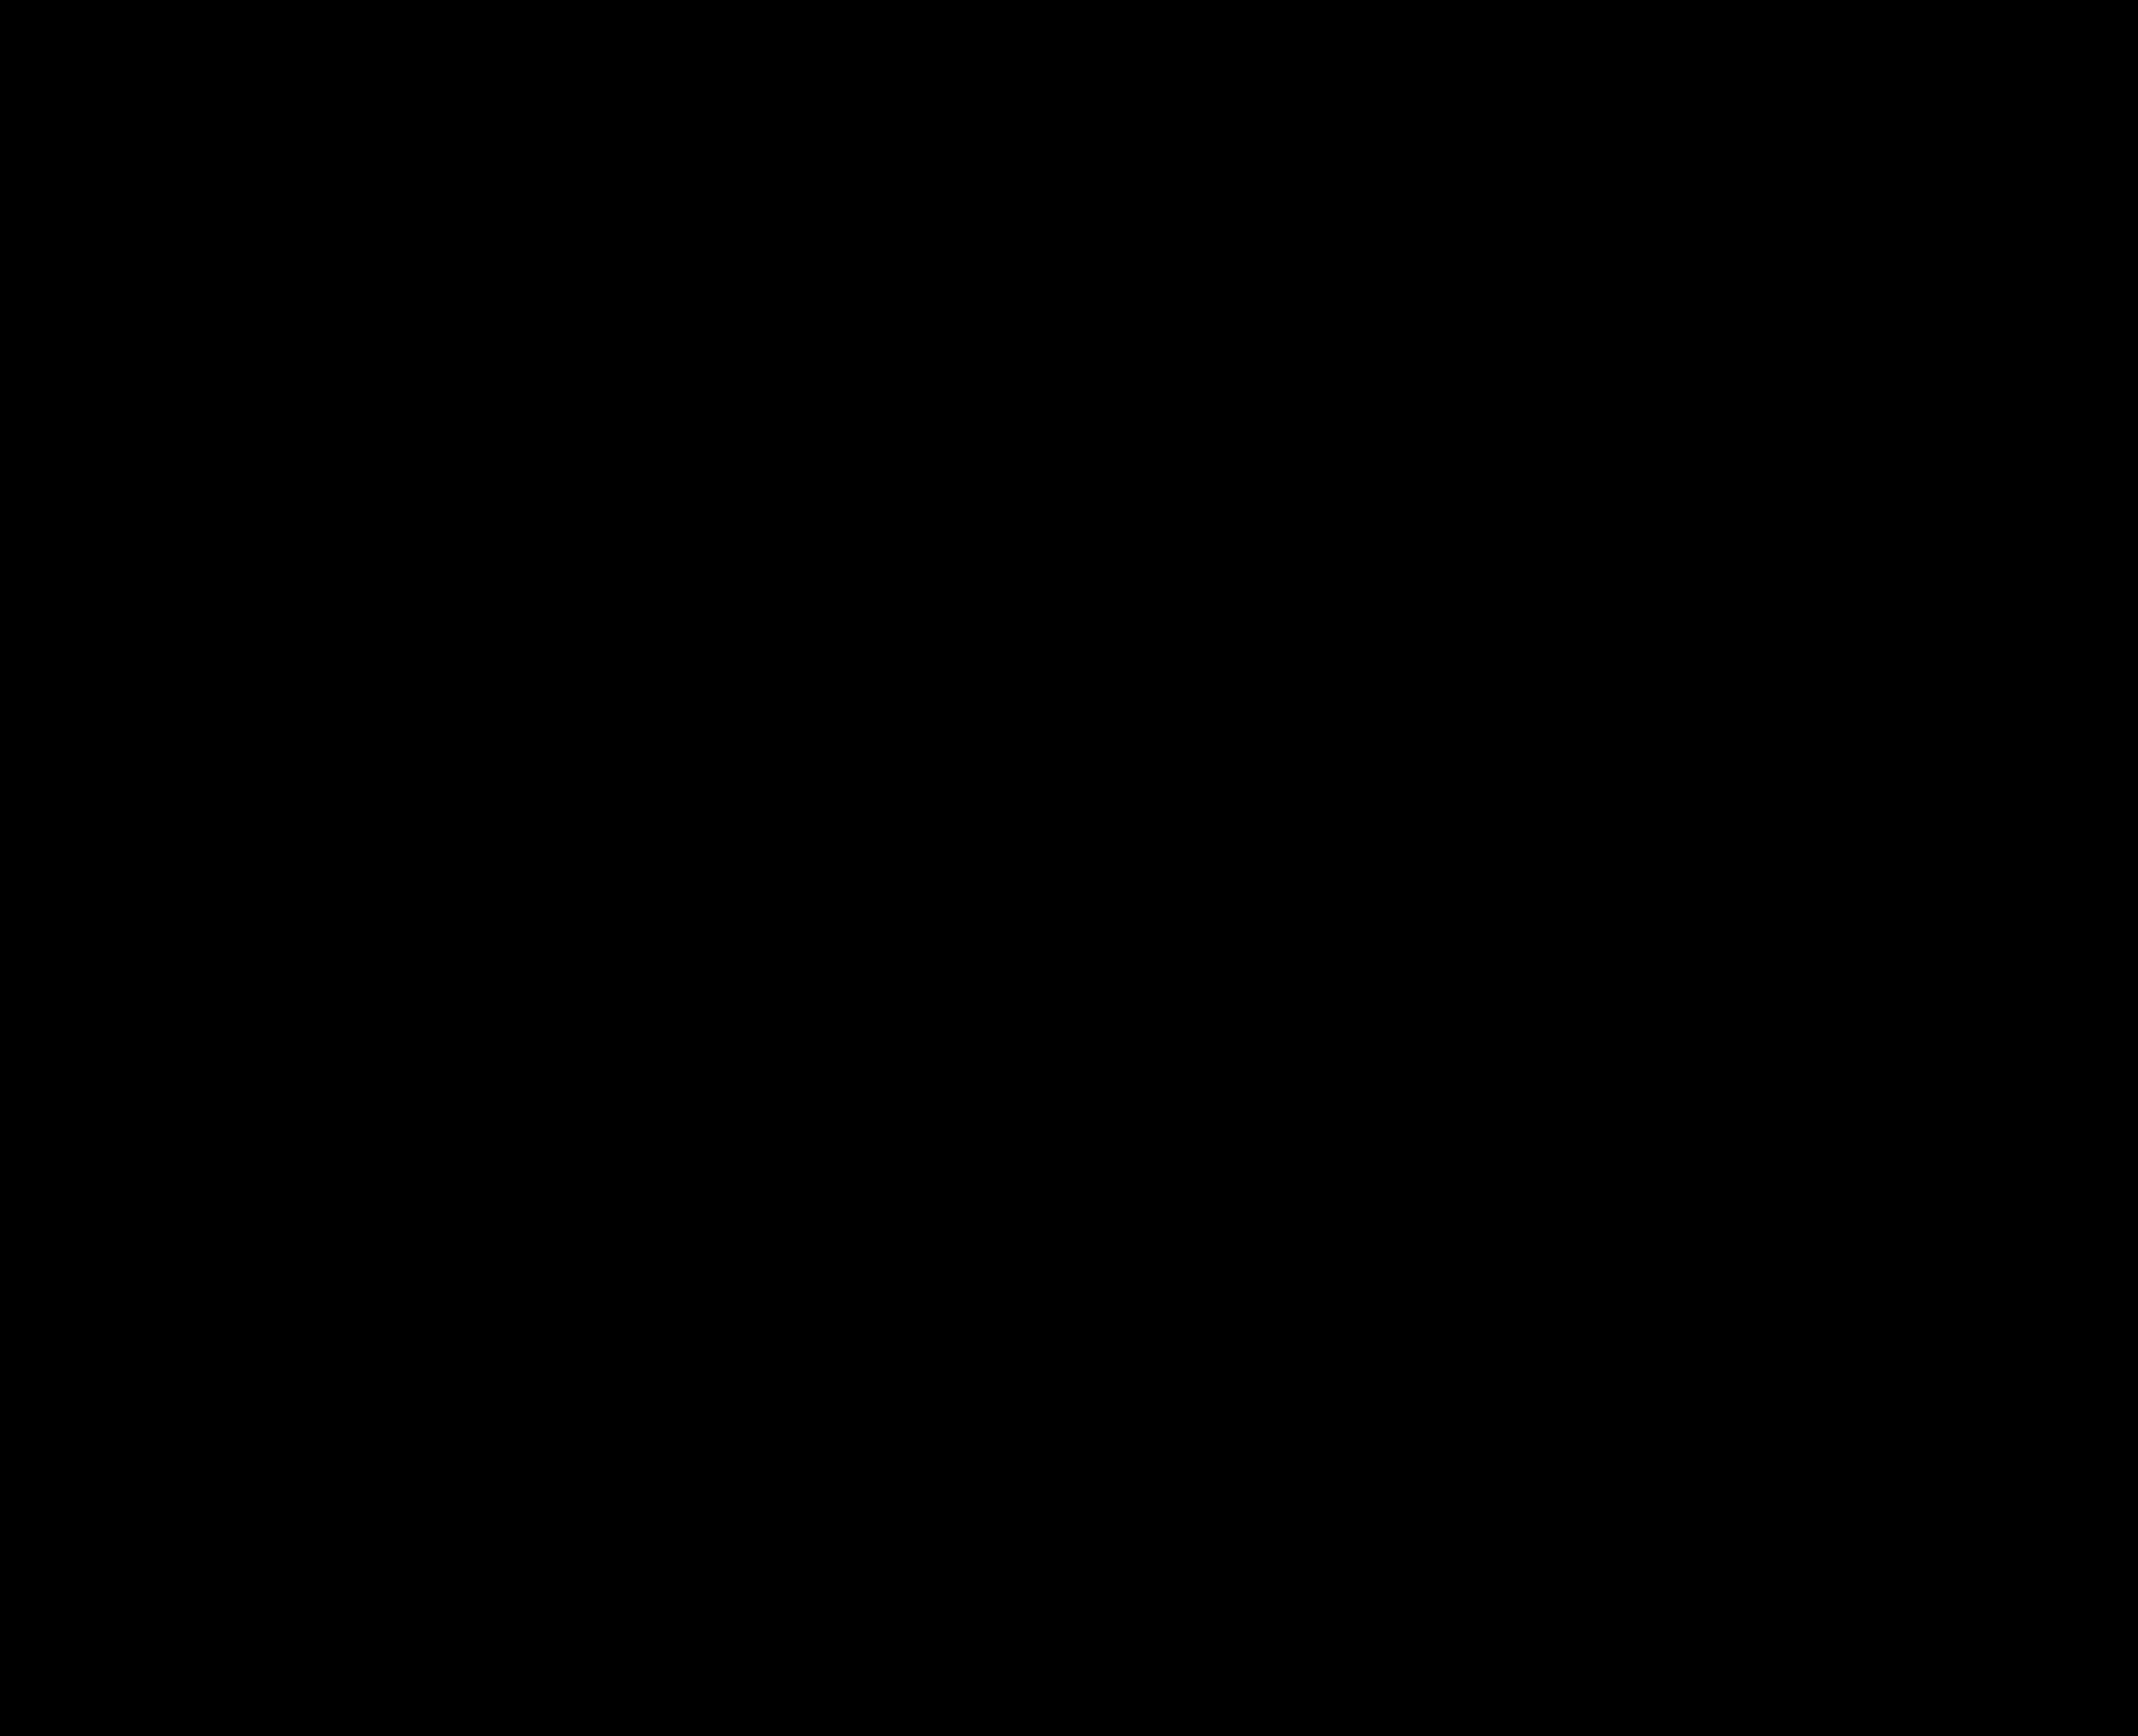 Clip Art Stock Computer Icons Typography Symbol.